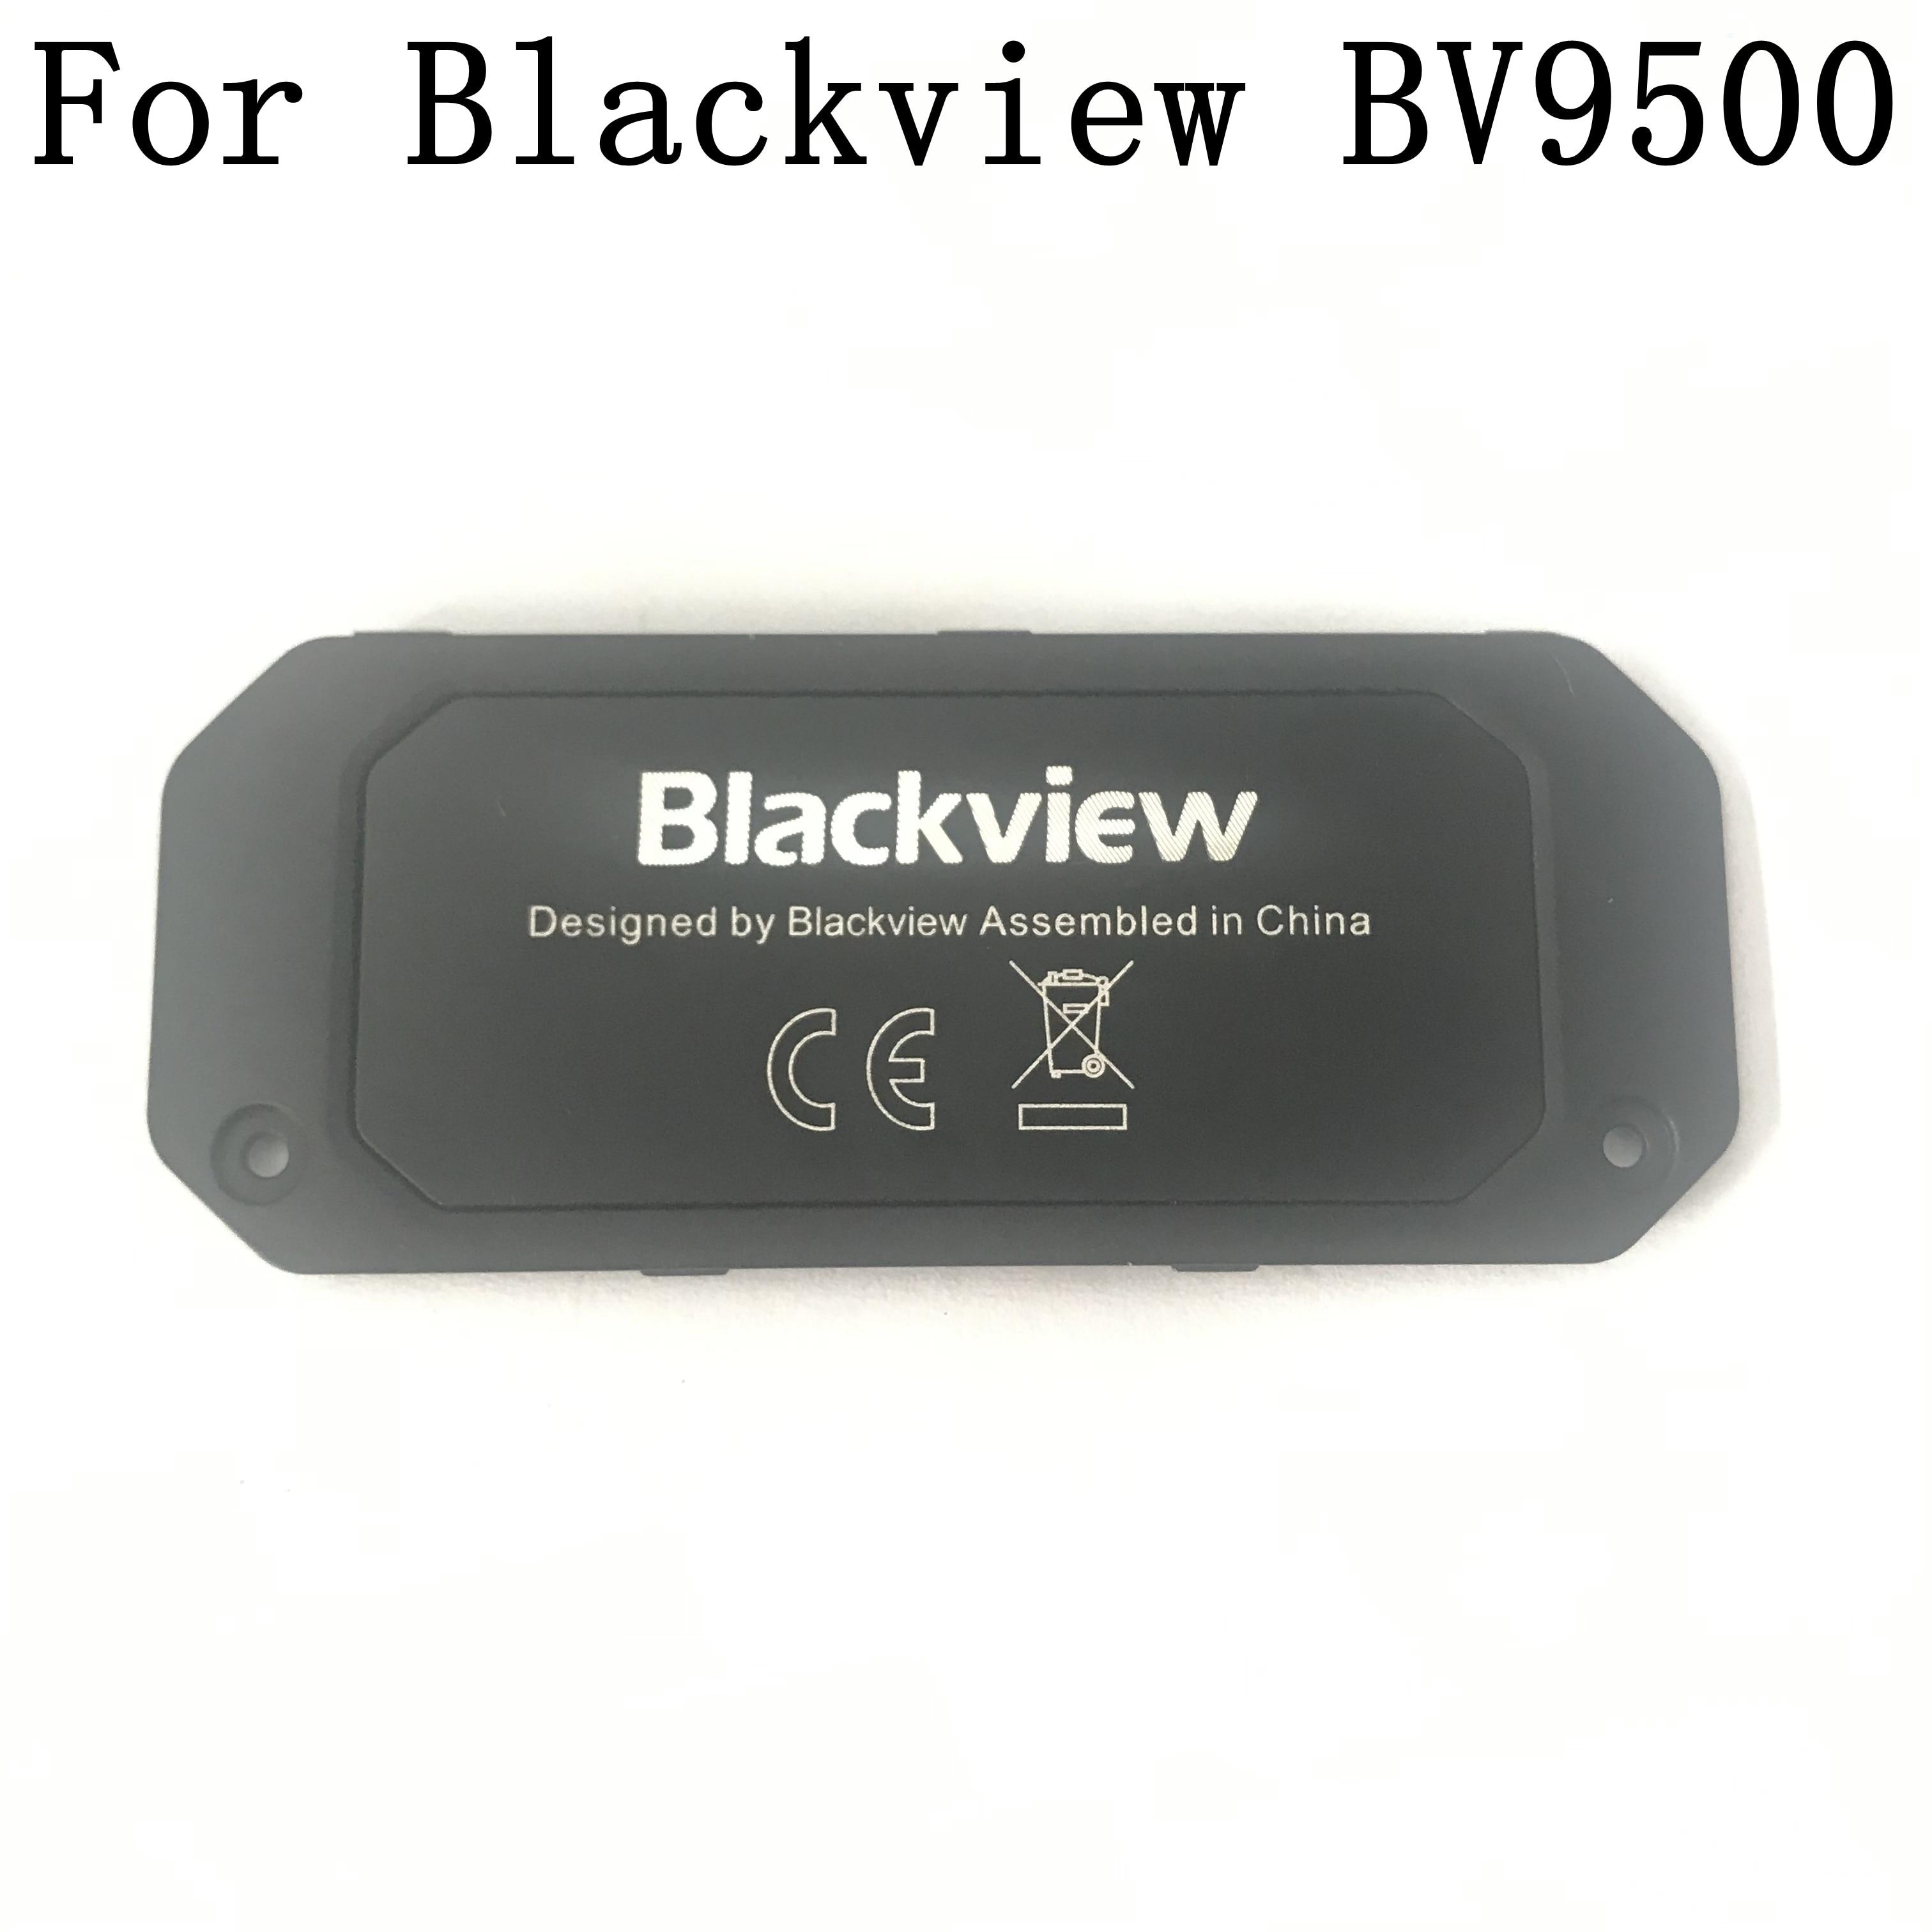 Blackview BV9500 Оригинальный Новый чехол для sim-карты с задней рамкой для Blackview BV9500 Pro Чехол для sim-карты